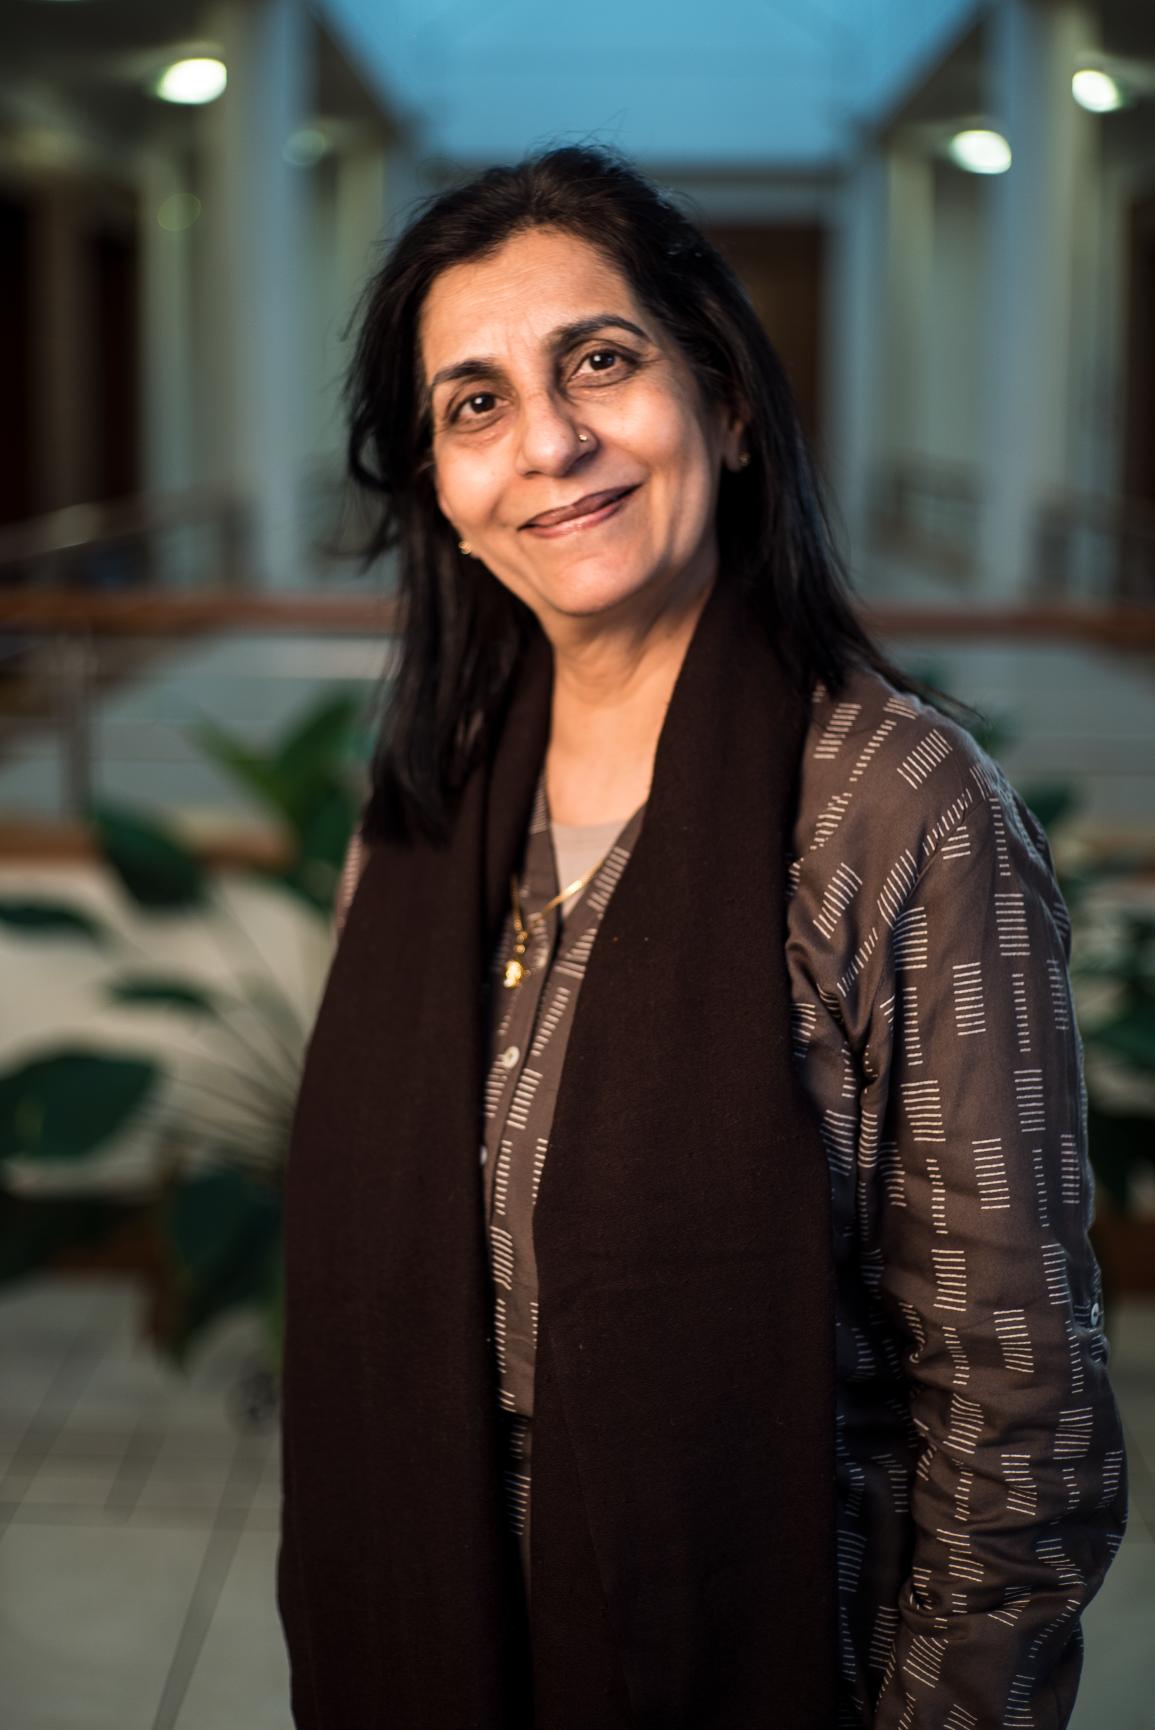 Nisha Tandon OBE, Founder and Director of ArtsEkta